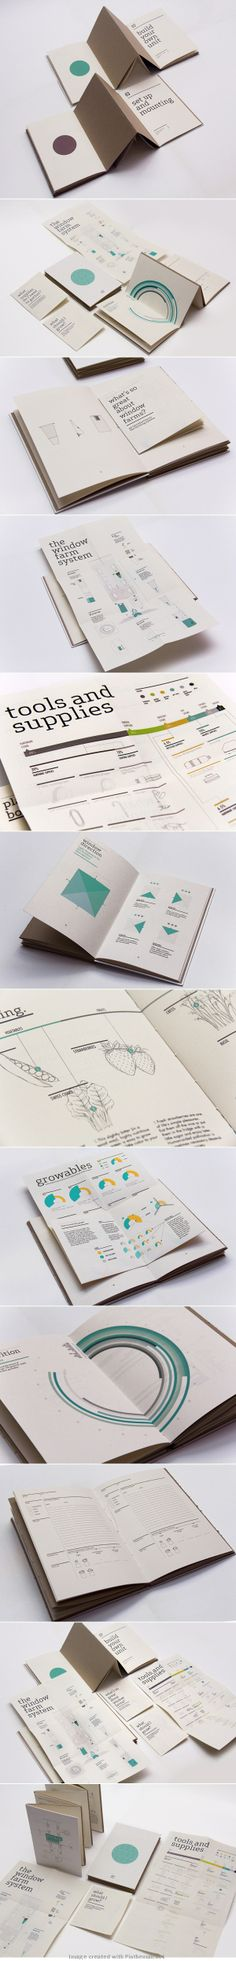 Window Farms: Information Design Book by Jiani Lu